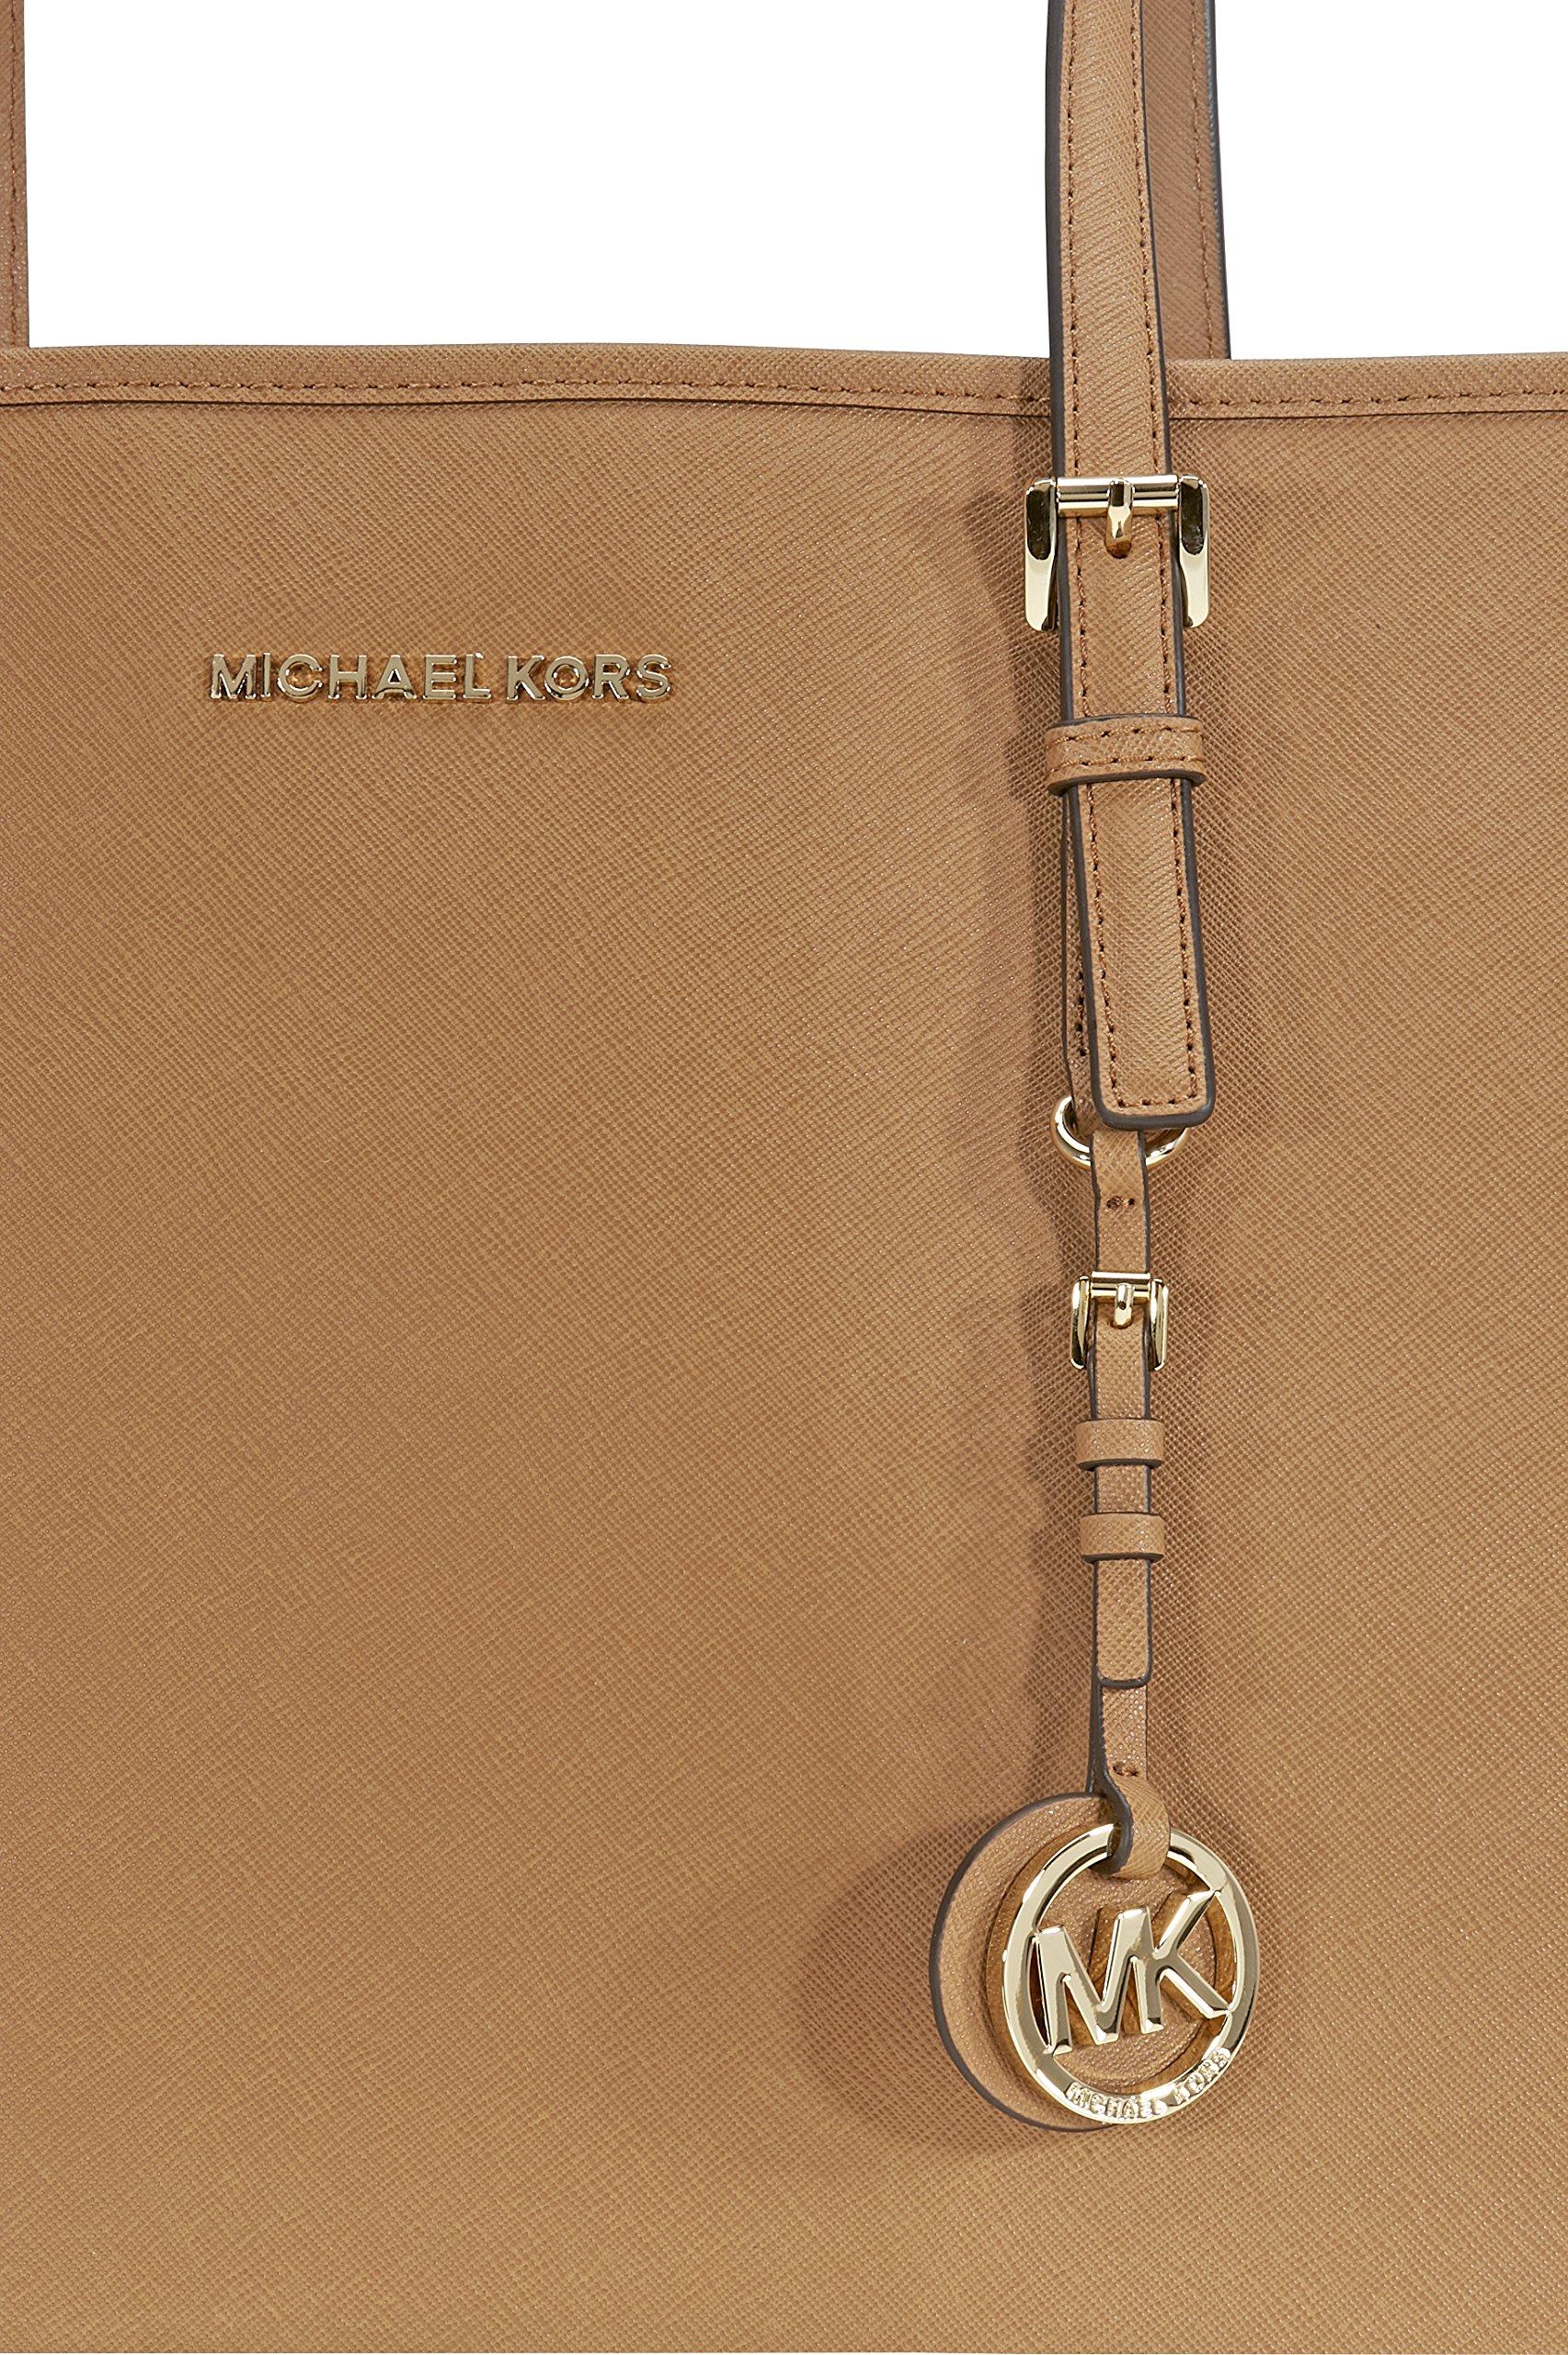 Michael Kors Jet Set Medium Travel Saffiano Leather Tote - Acorn by Michael Kors (Image #4)